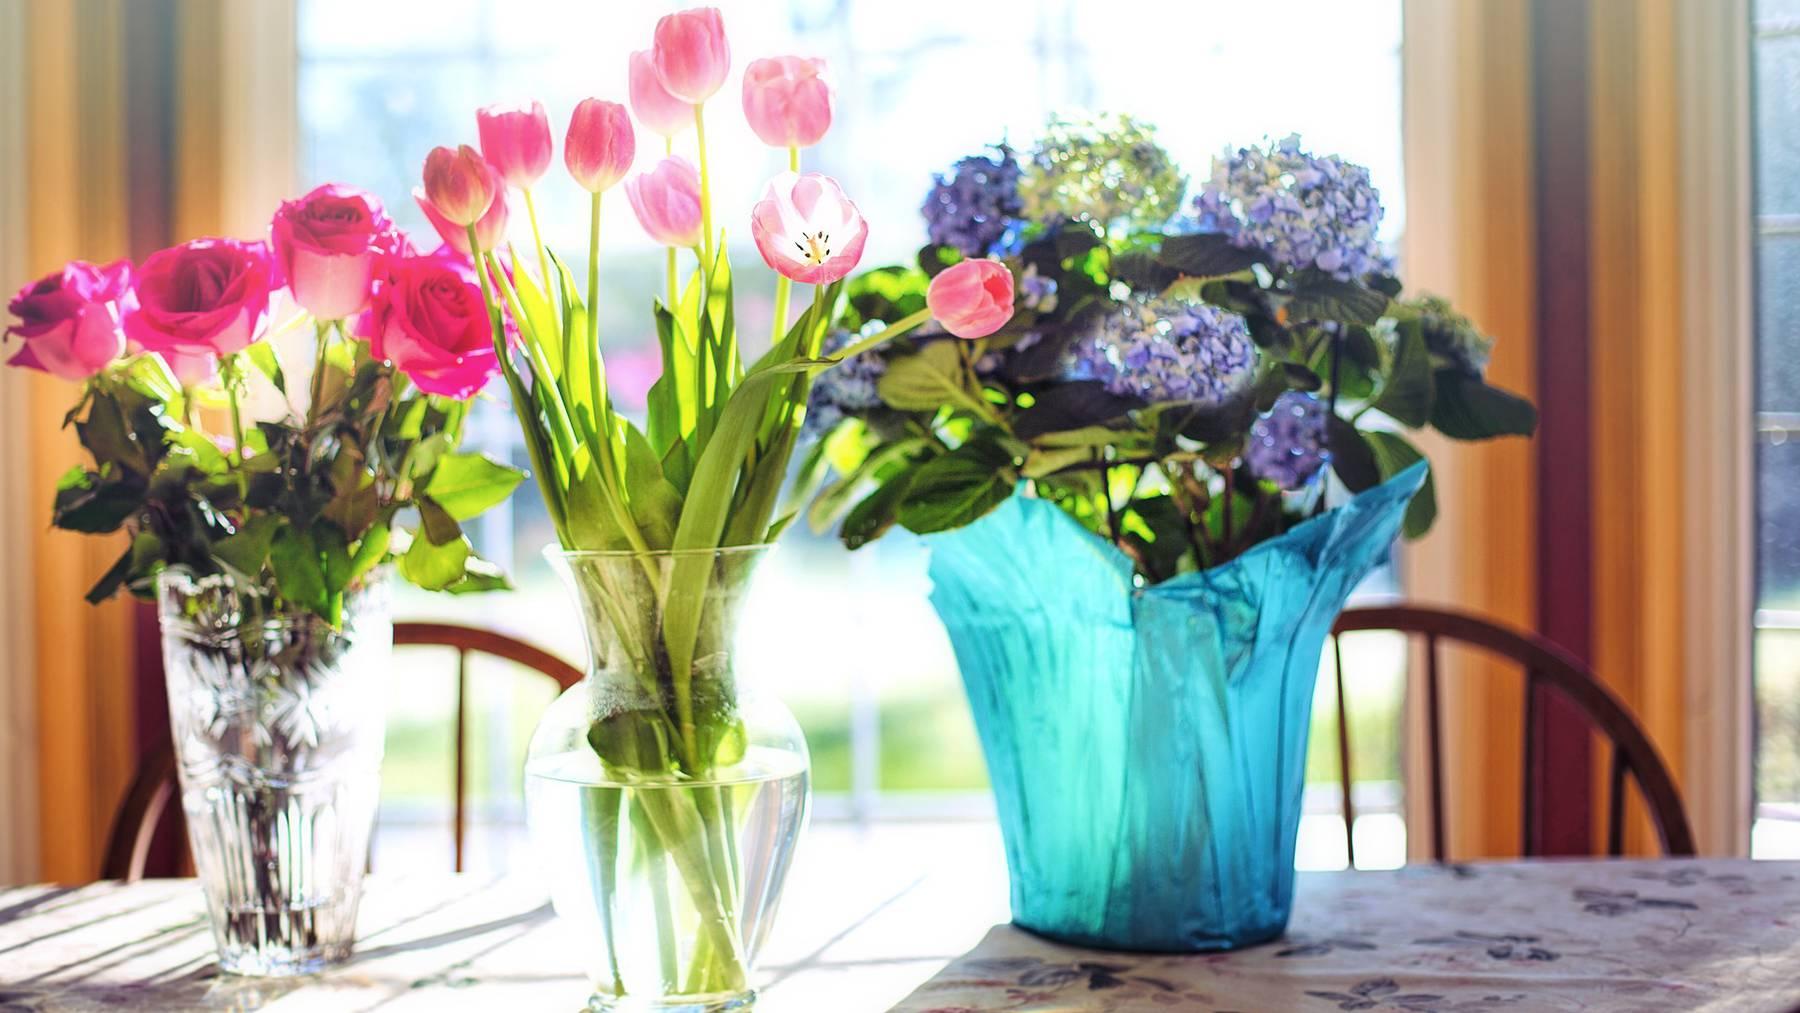 flowers-2239232_1920